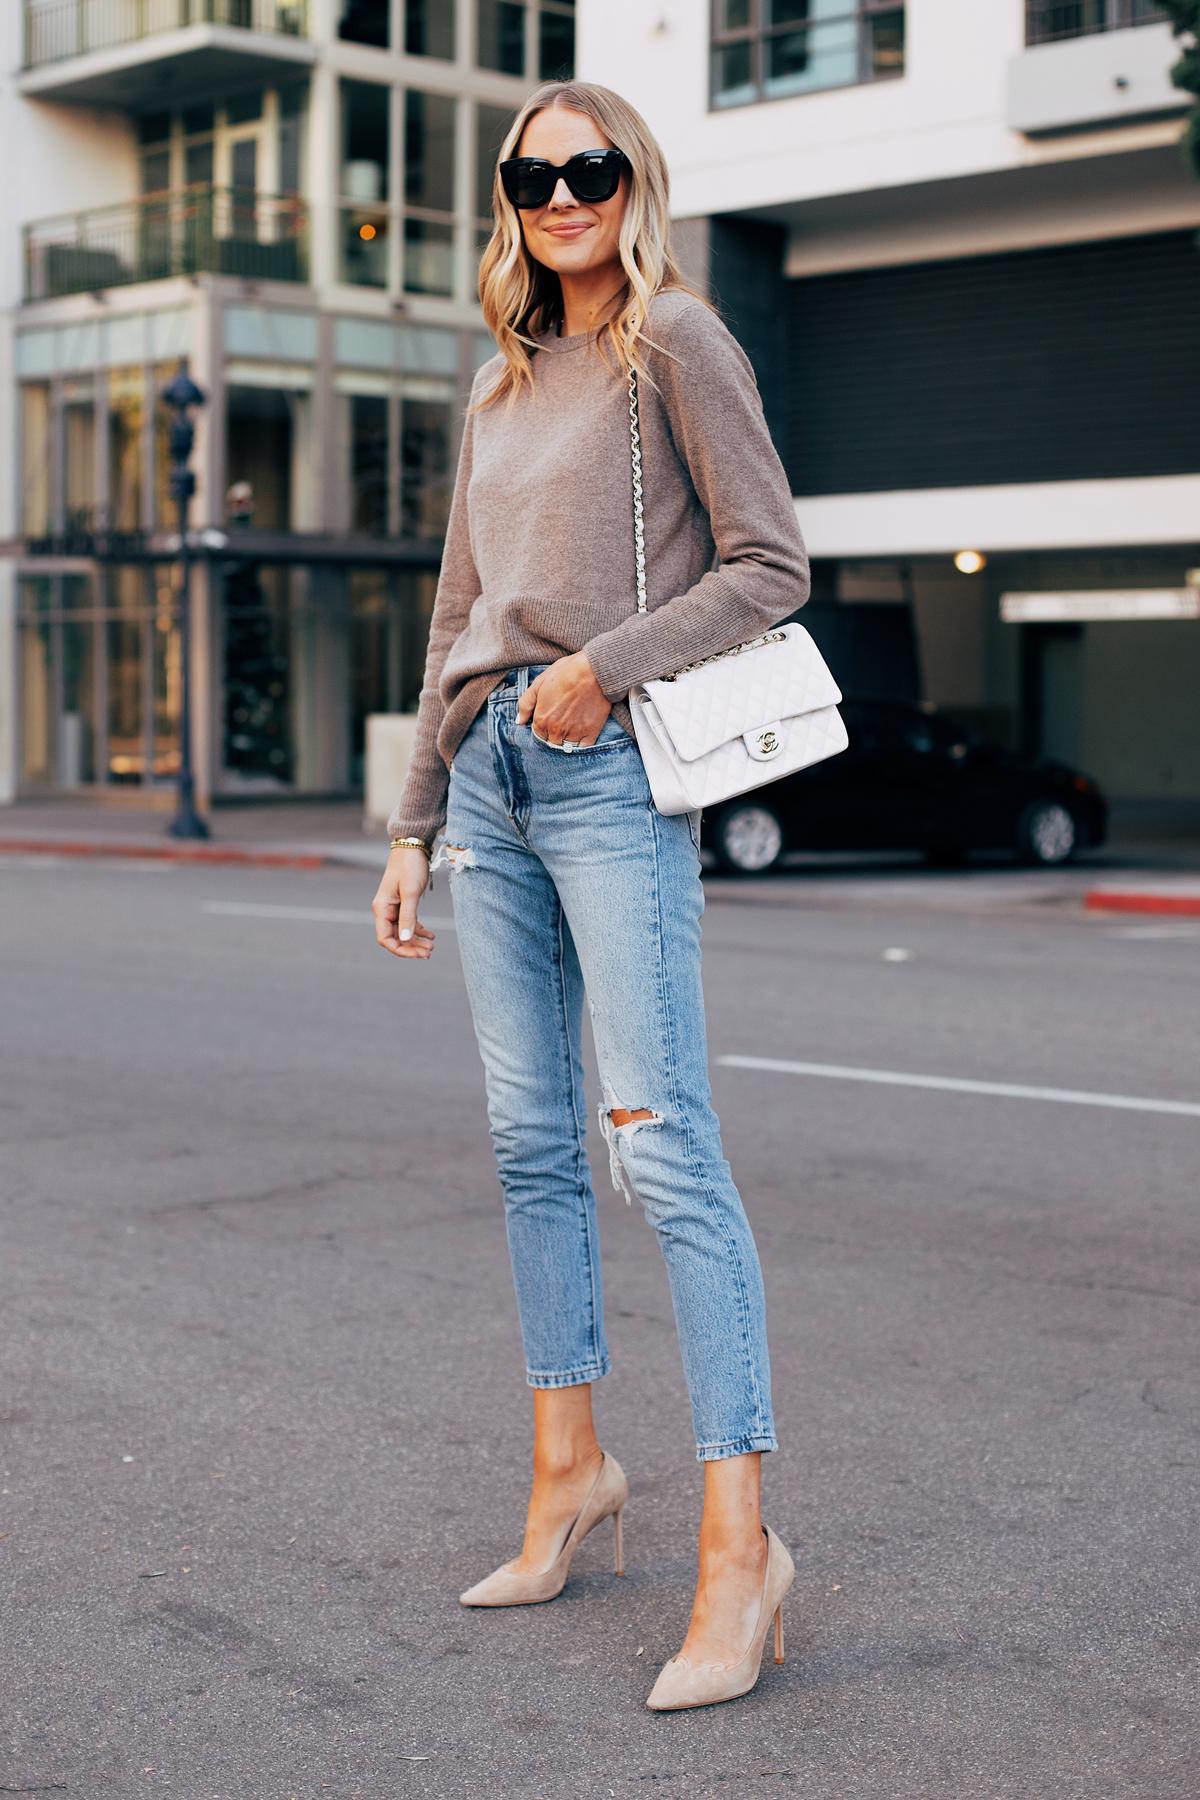 Fashion Jackson Wearing Tan Cashmere Sweater Leivs Ripped Jeans Tan Pumps White Chanel Handbag